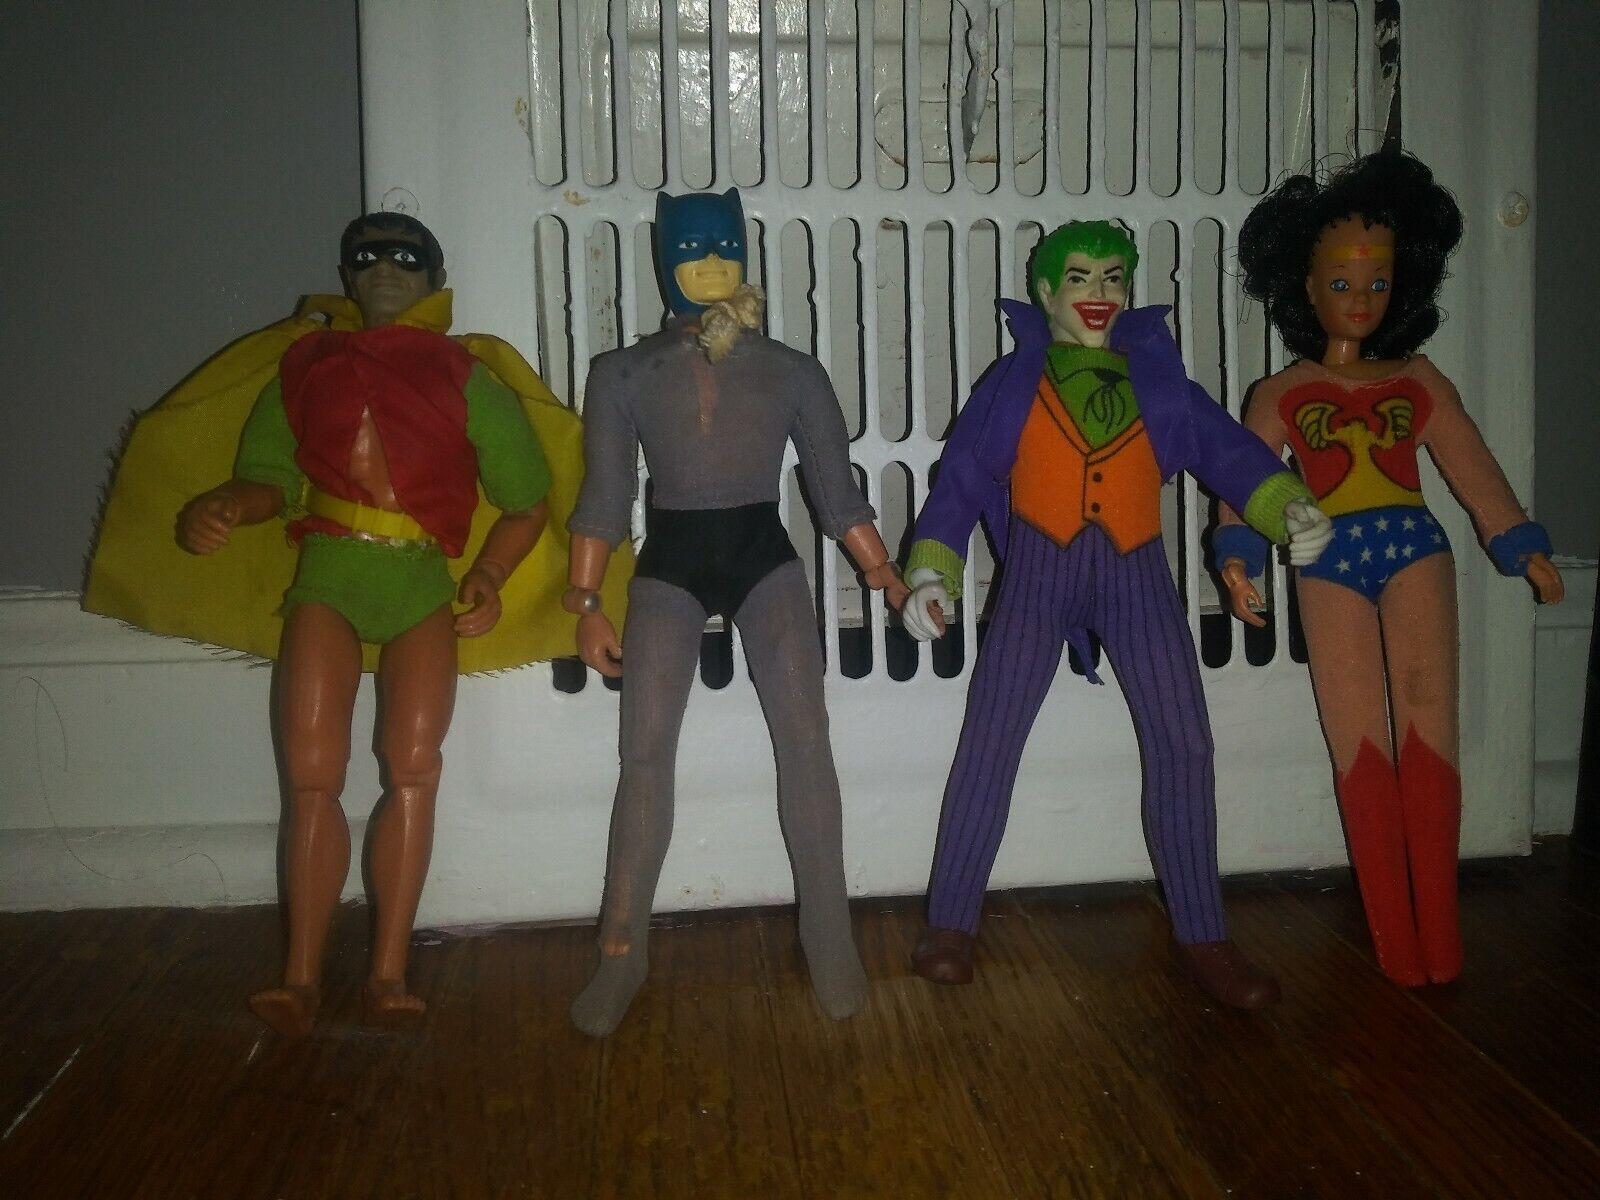 Lot Of 4 Vintage Batuomo Robin  Joker Wonder donna cifras  prezzi eccellenti